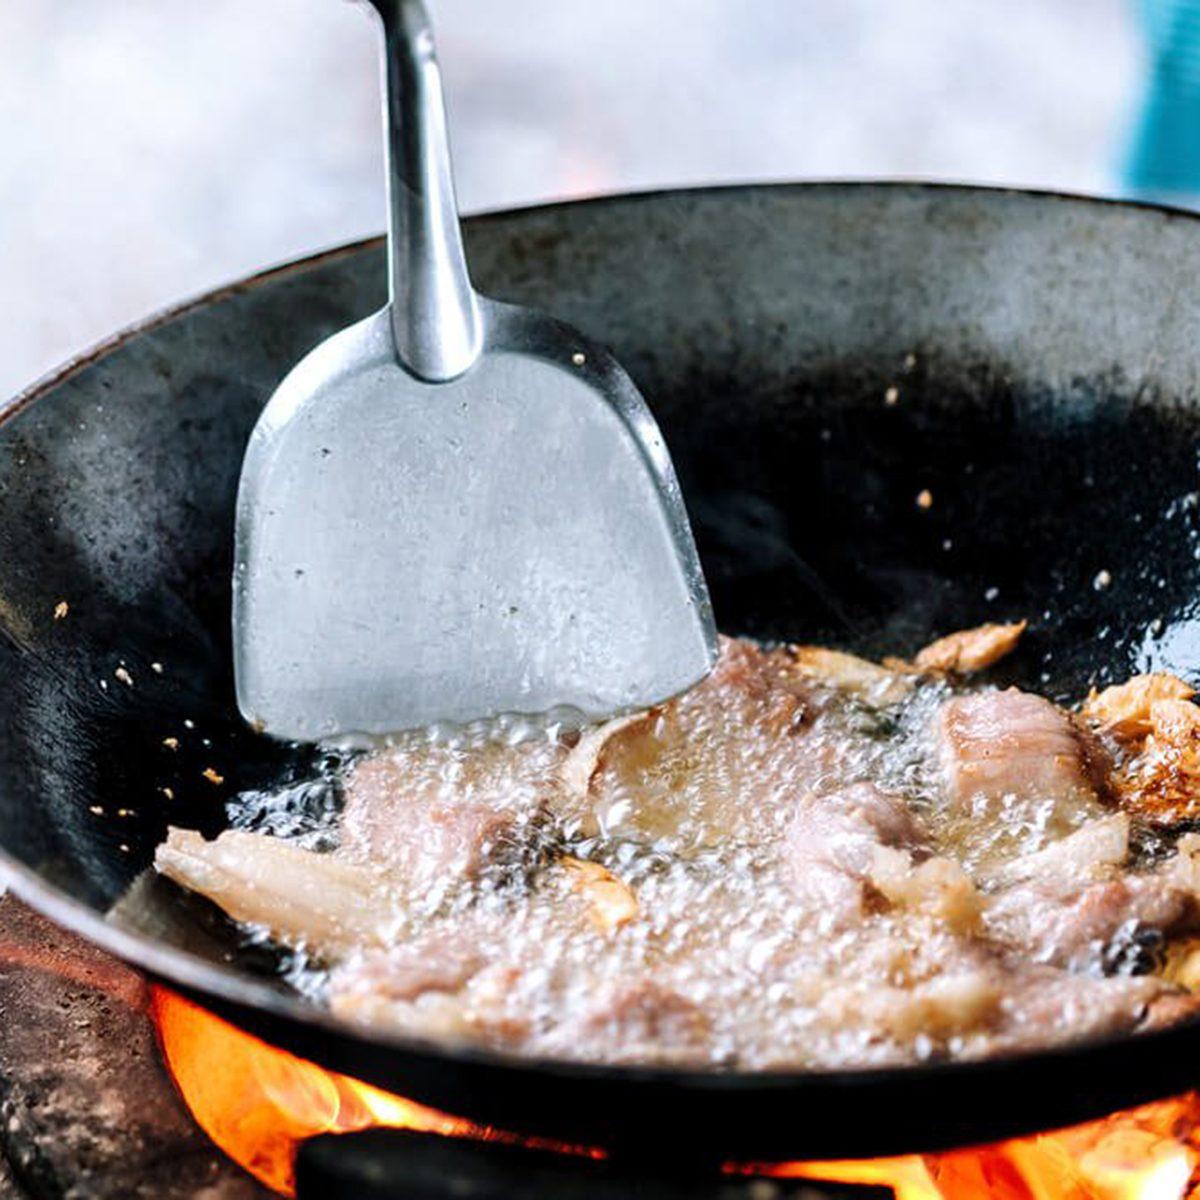 Frying fish in oil